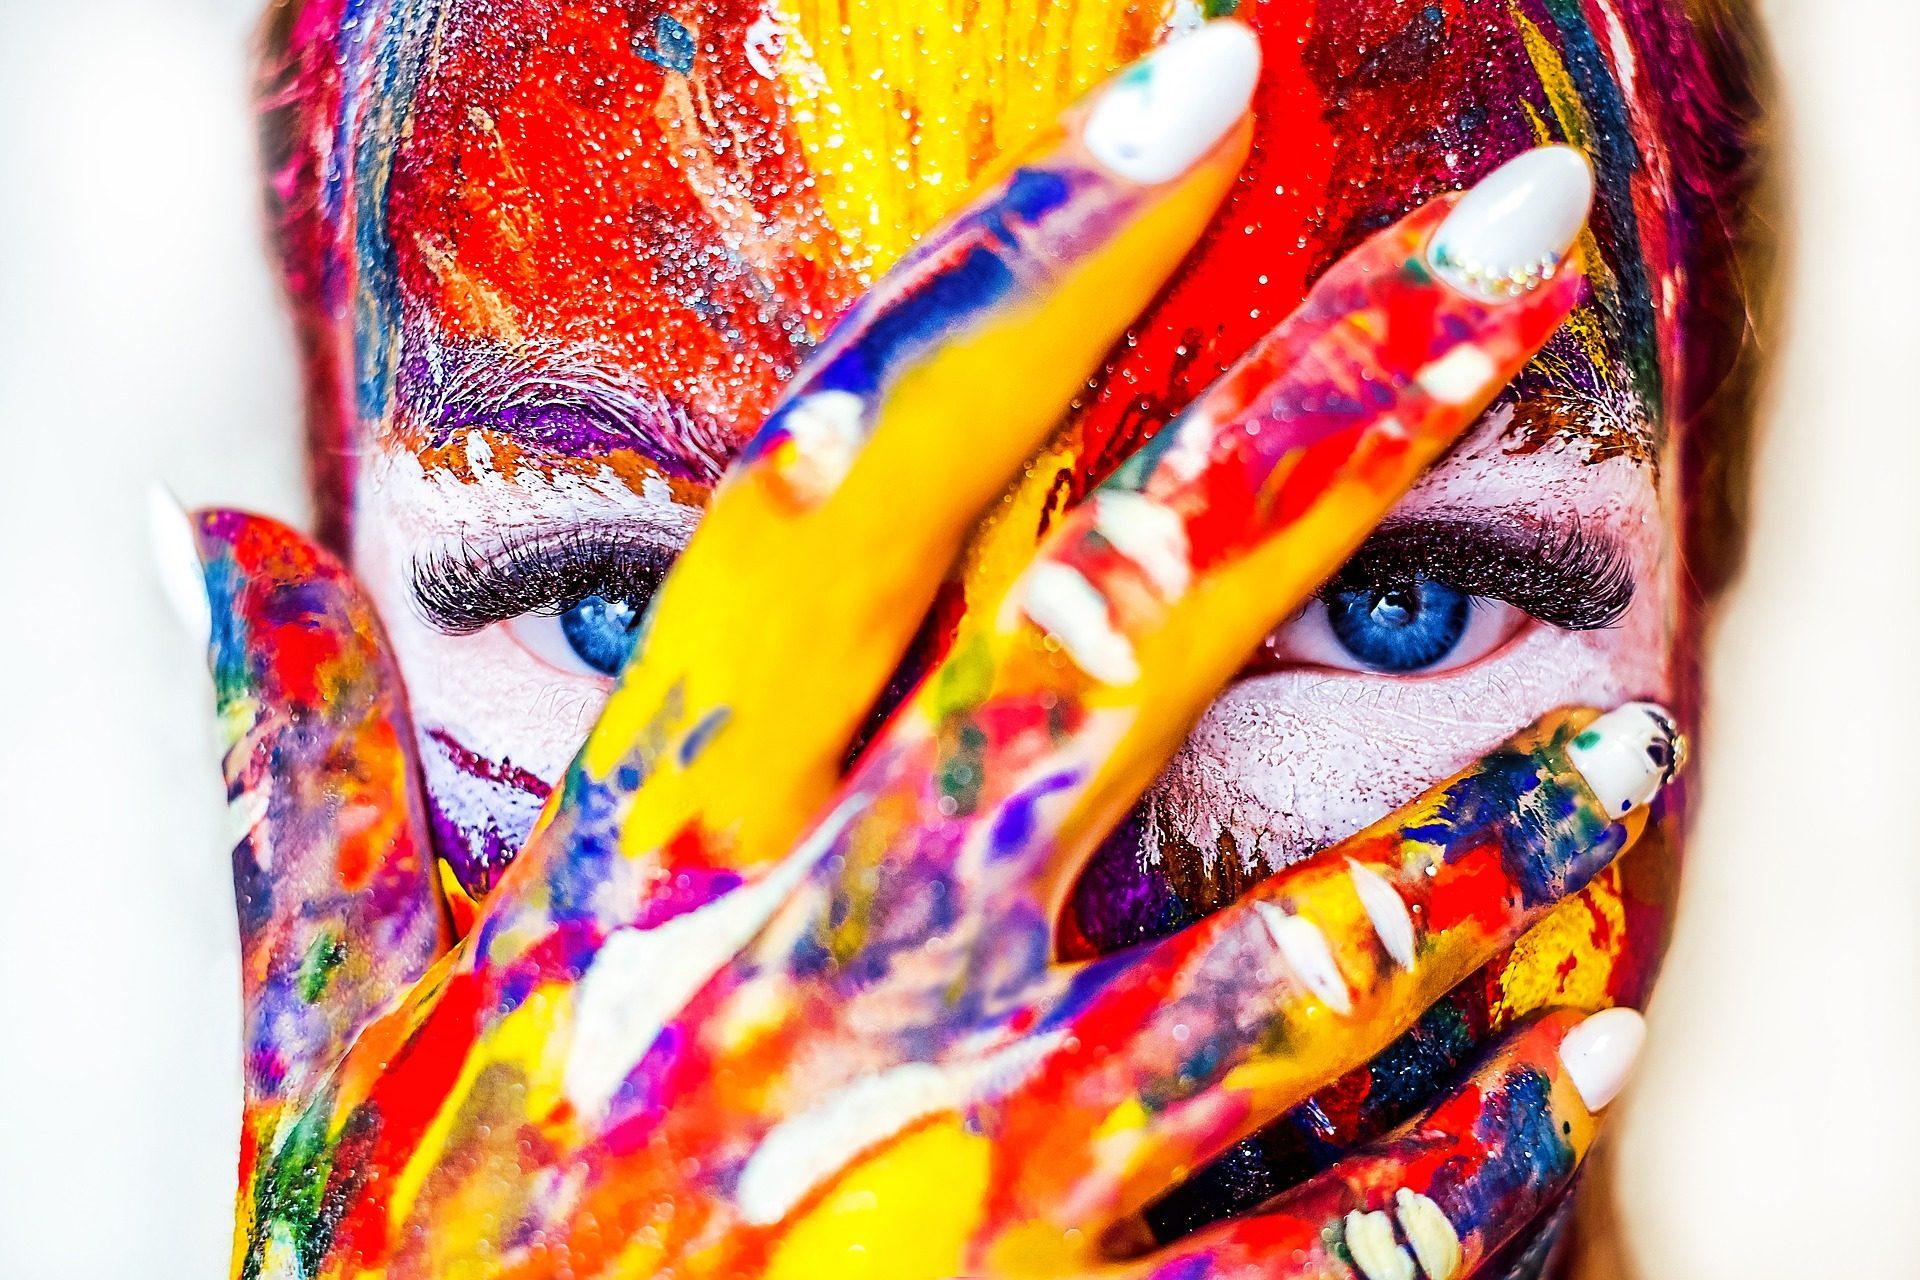 mujer, cara, pintura, disfraz, ojos, azules, uñas - Fondos de Pantalla HD - professor-falken.com